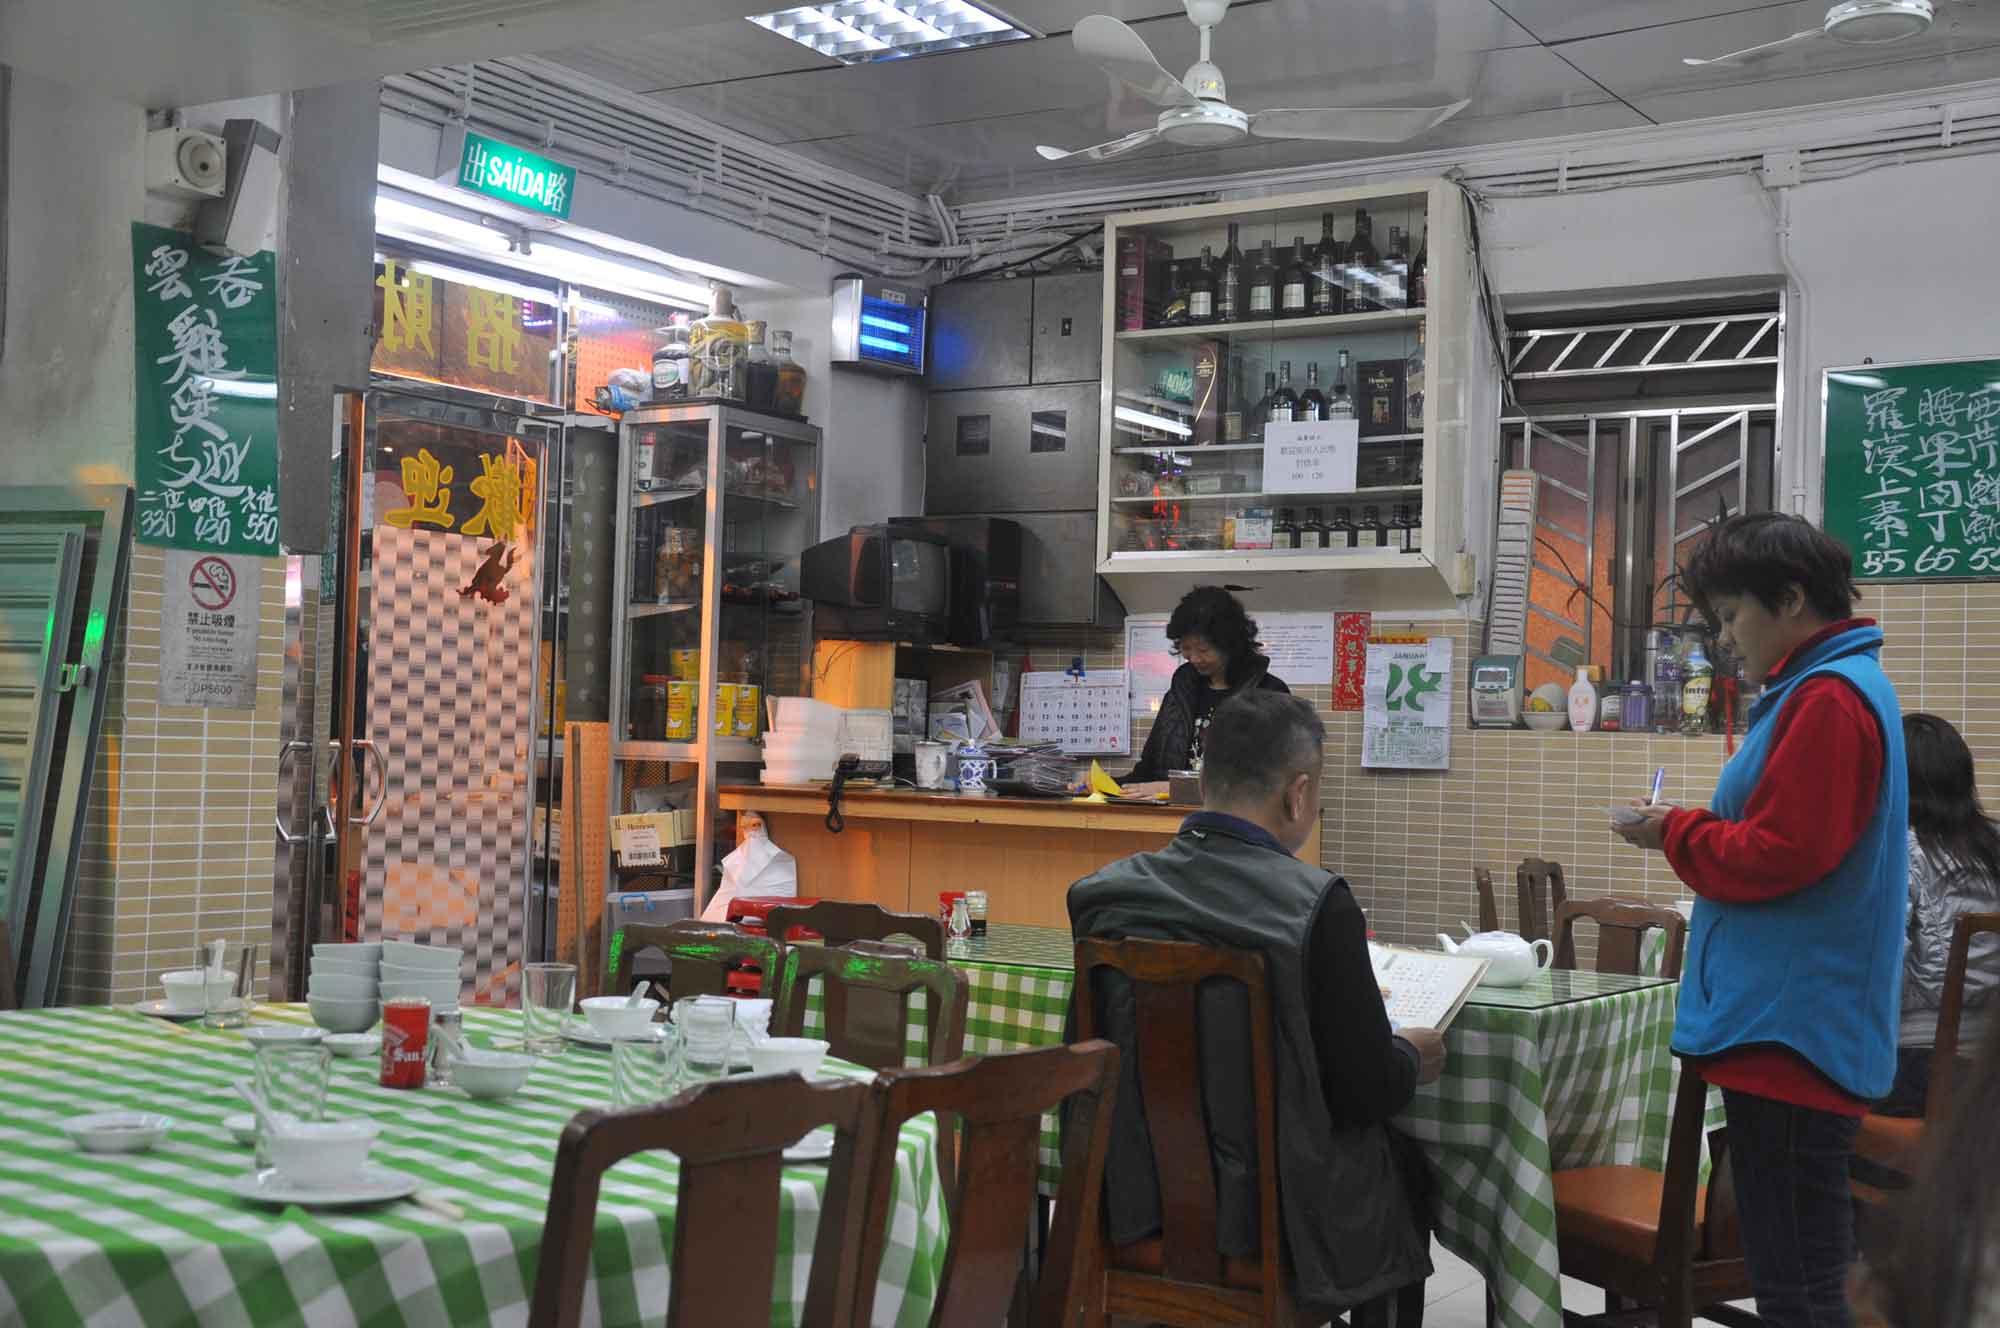 Mou Kei seafood restaurant interior